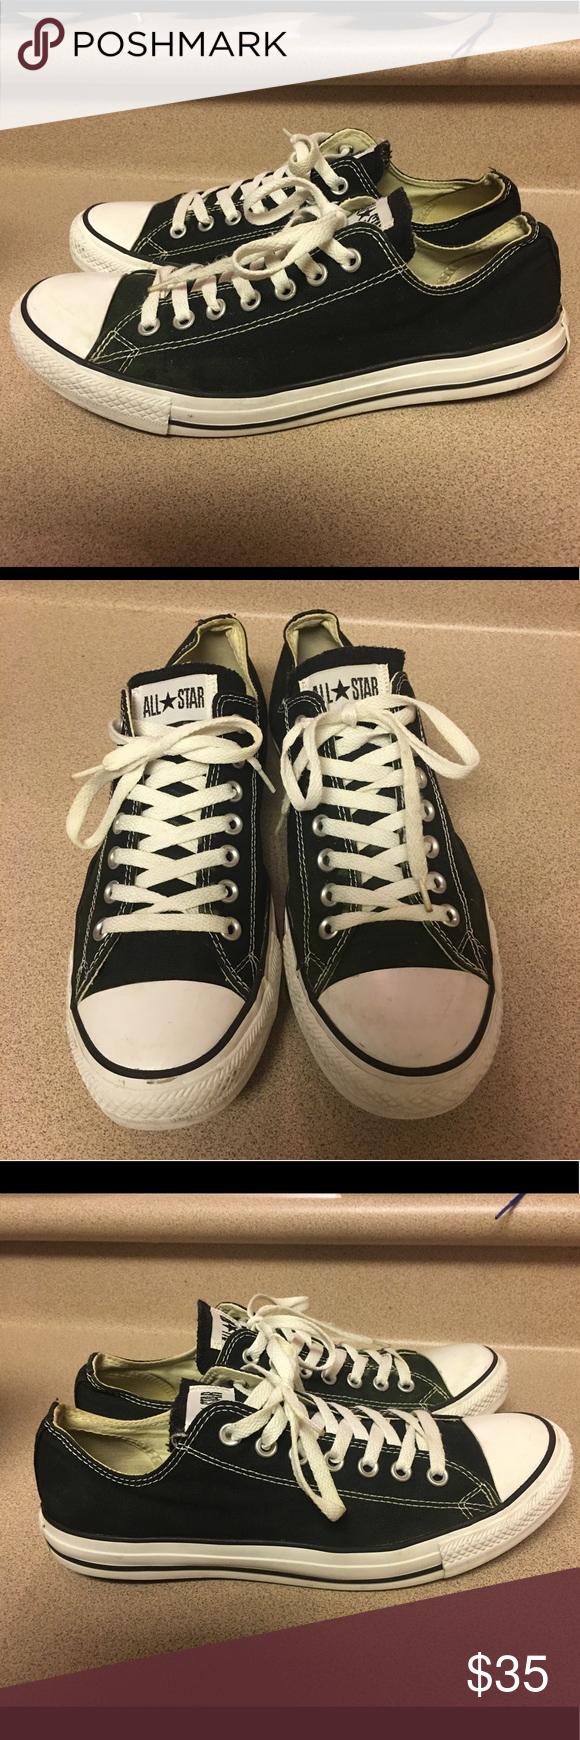 7338b8f76215 EUC Converse Chuck Taylor Mens Size 10 Black EUC Converse Chuck Taylor All  Star Mens Size 10 Ox Shoes Sneakers M9166 Black Converse Shoes Sneakers